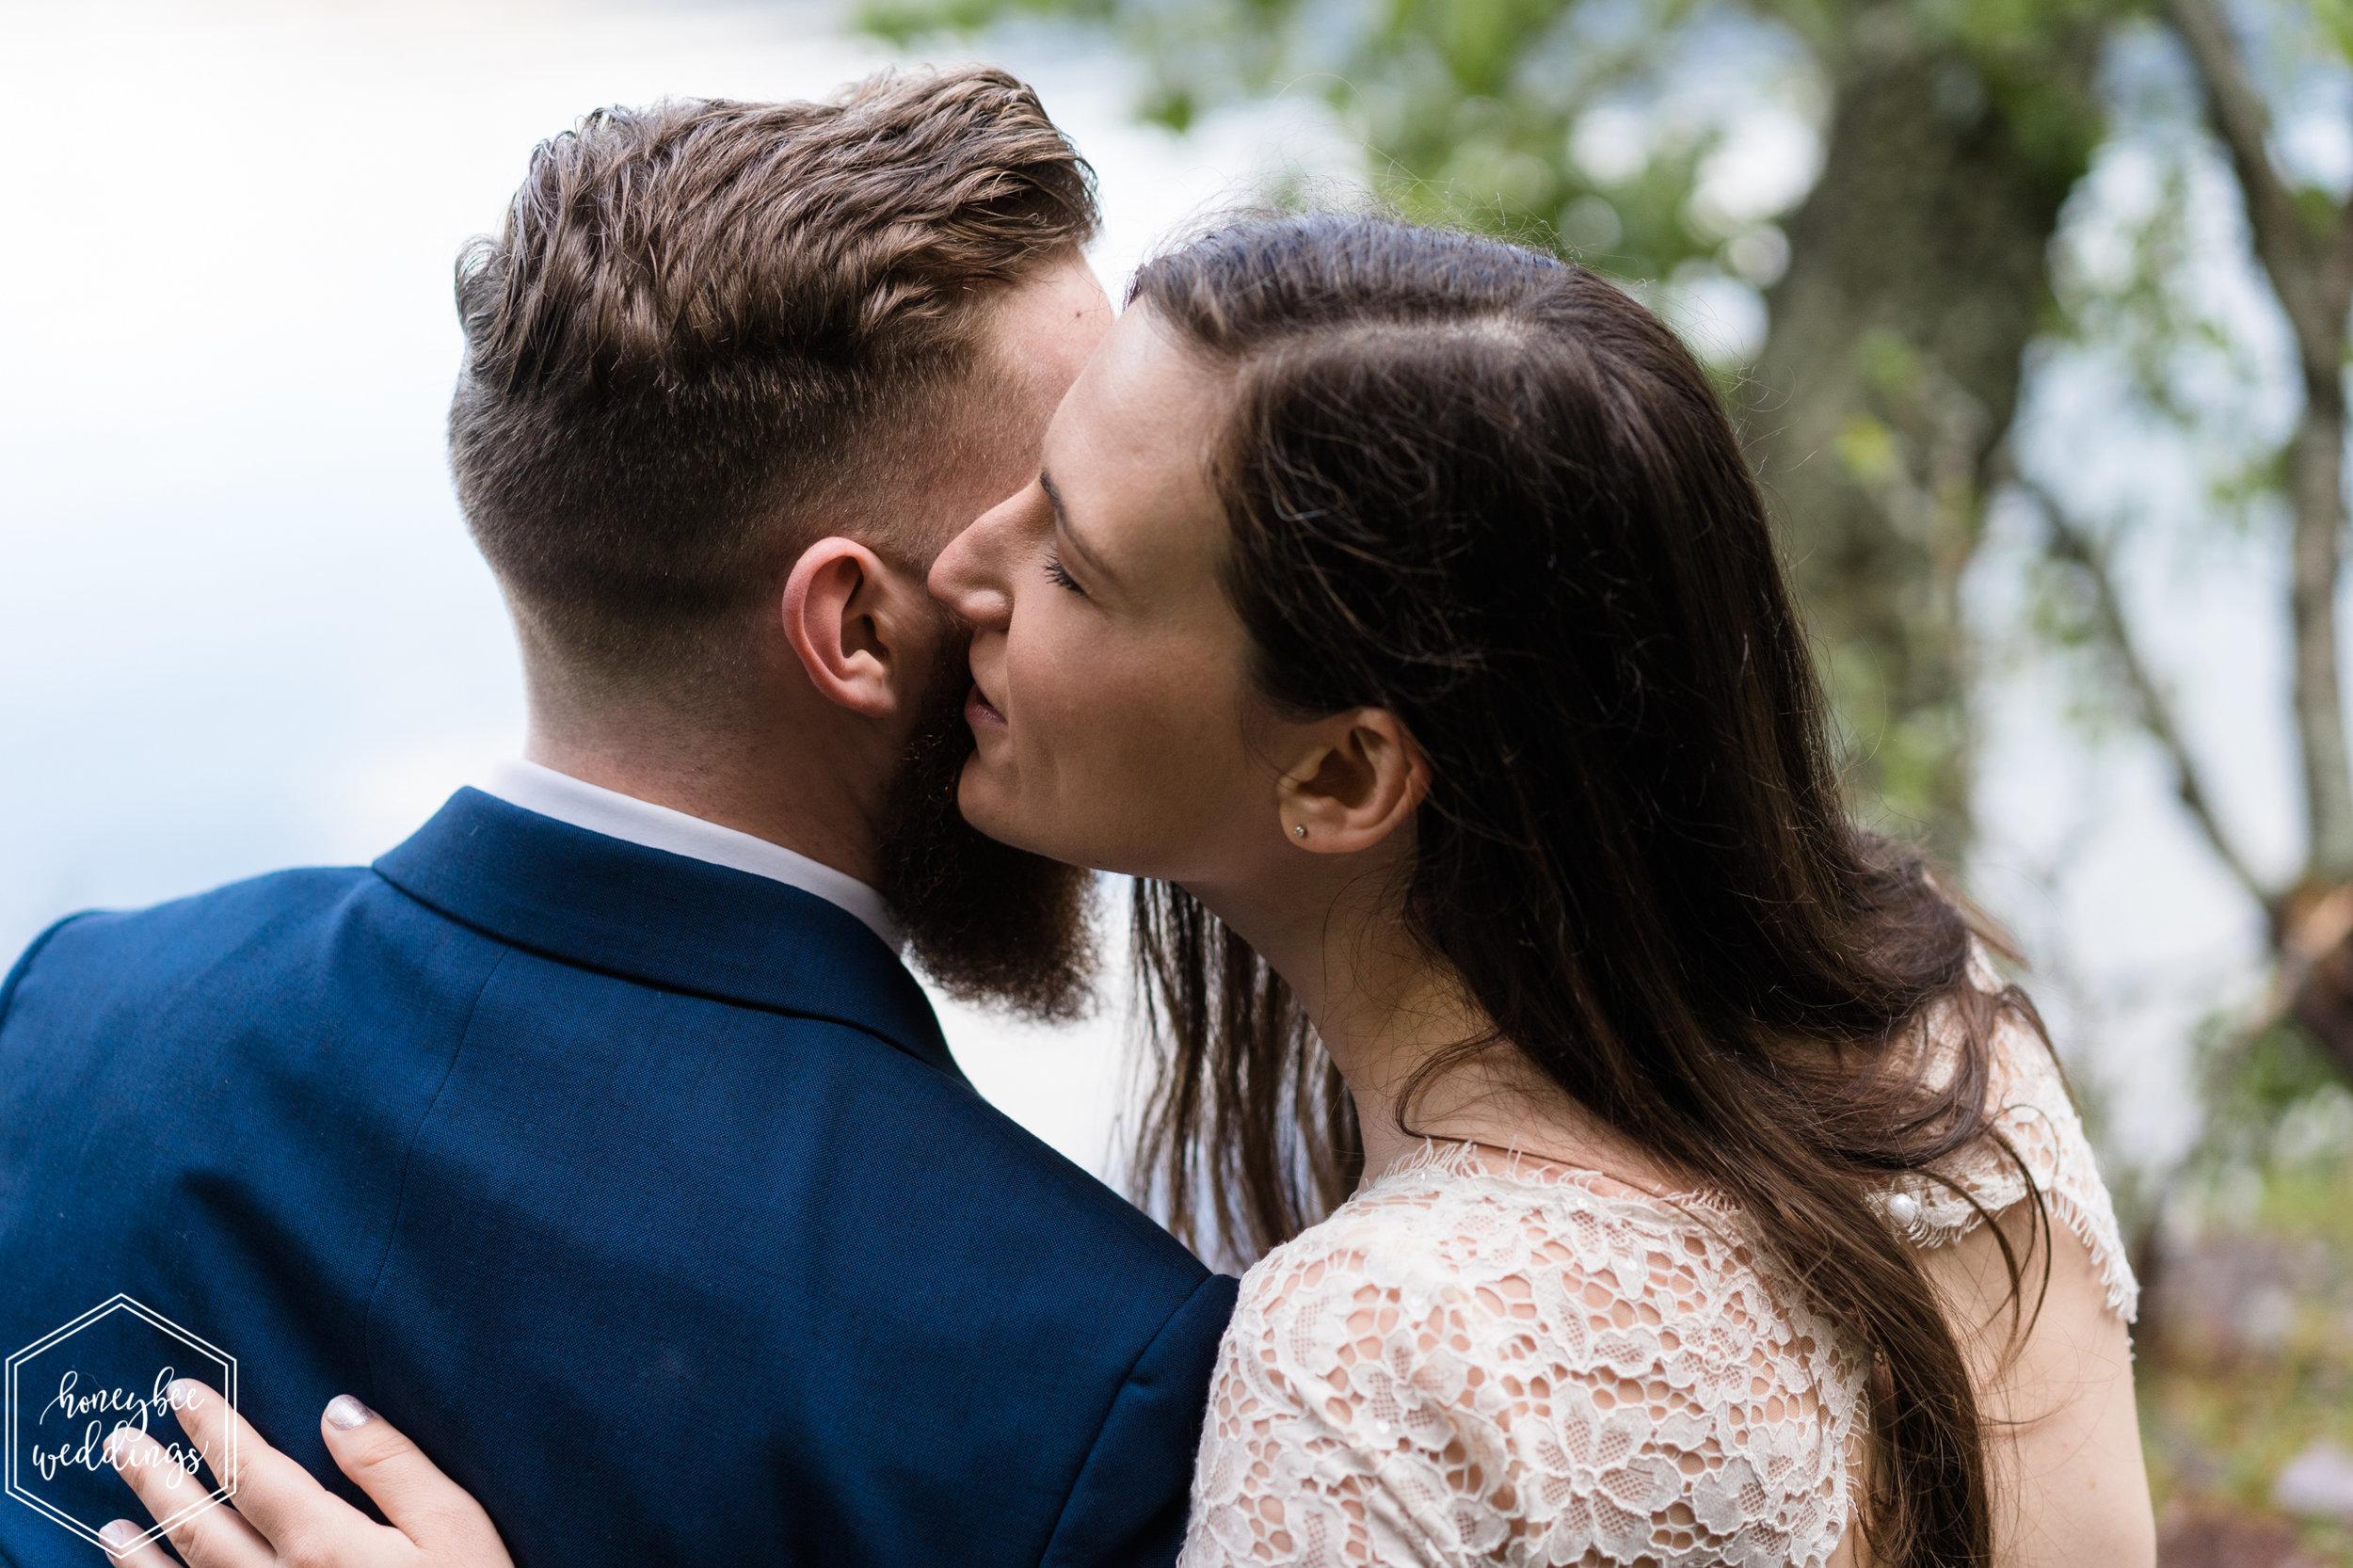 275Glacier National Park Wedding_Izaak Walton Inn Wedding_Honeybee Weddings_Norah & Kyle_June 09, 2019-118.jpg